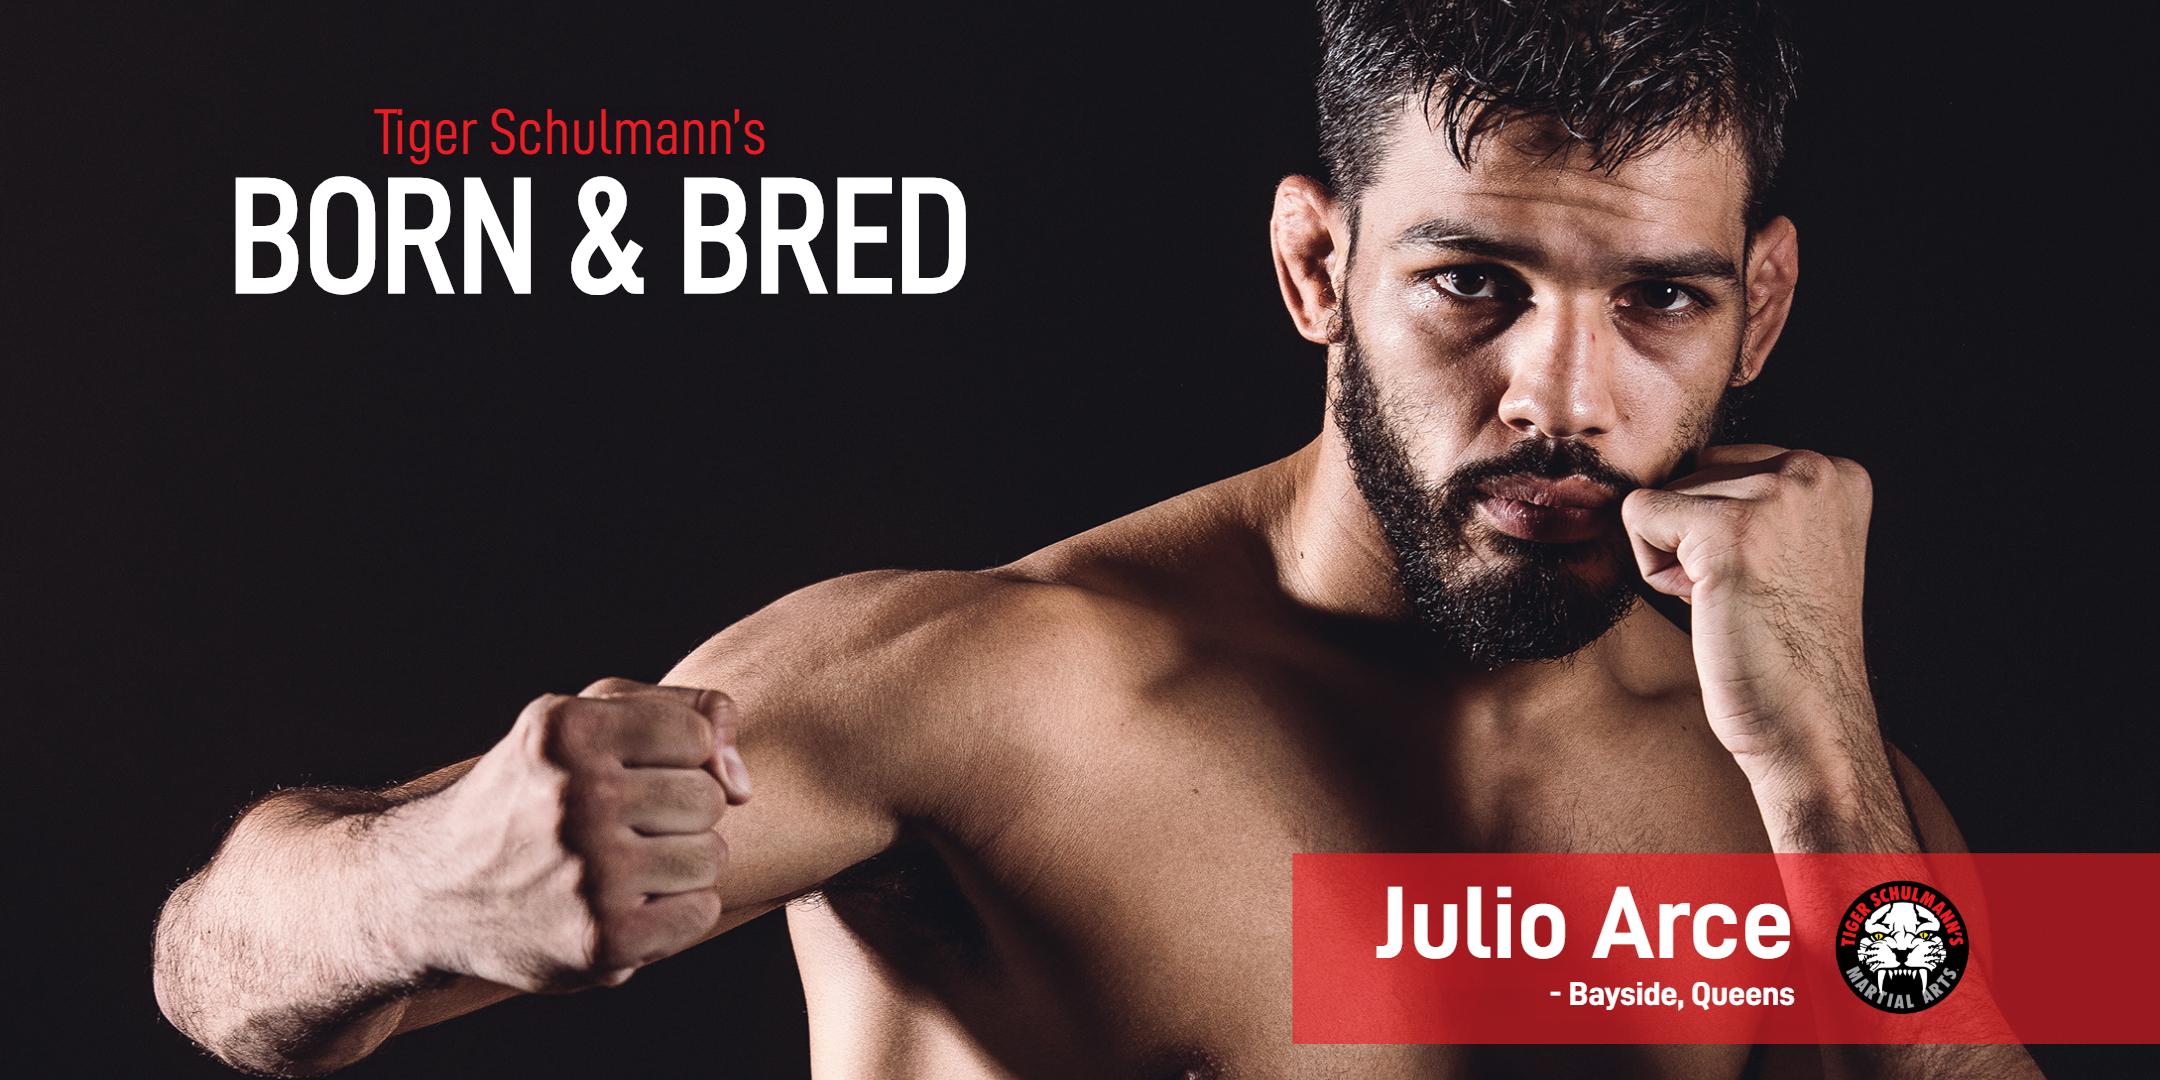 Tiger Schulmann's Martial Arts | Julio Arce